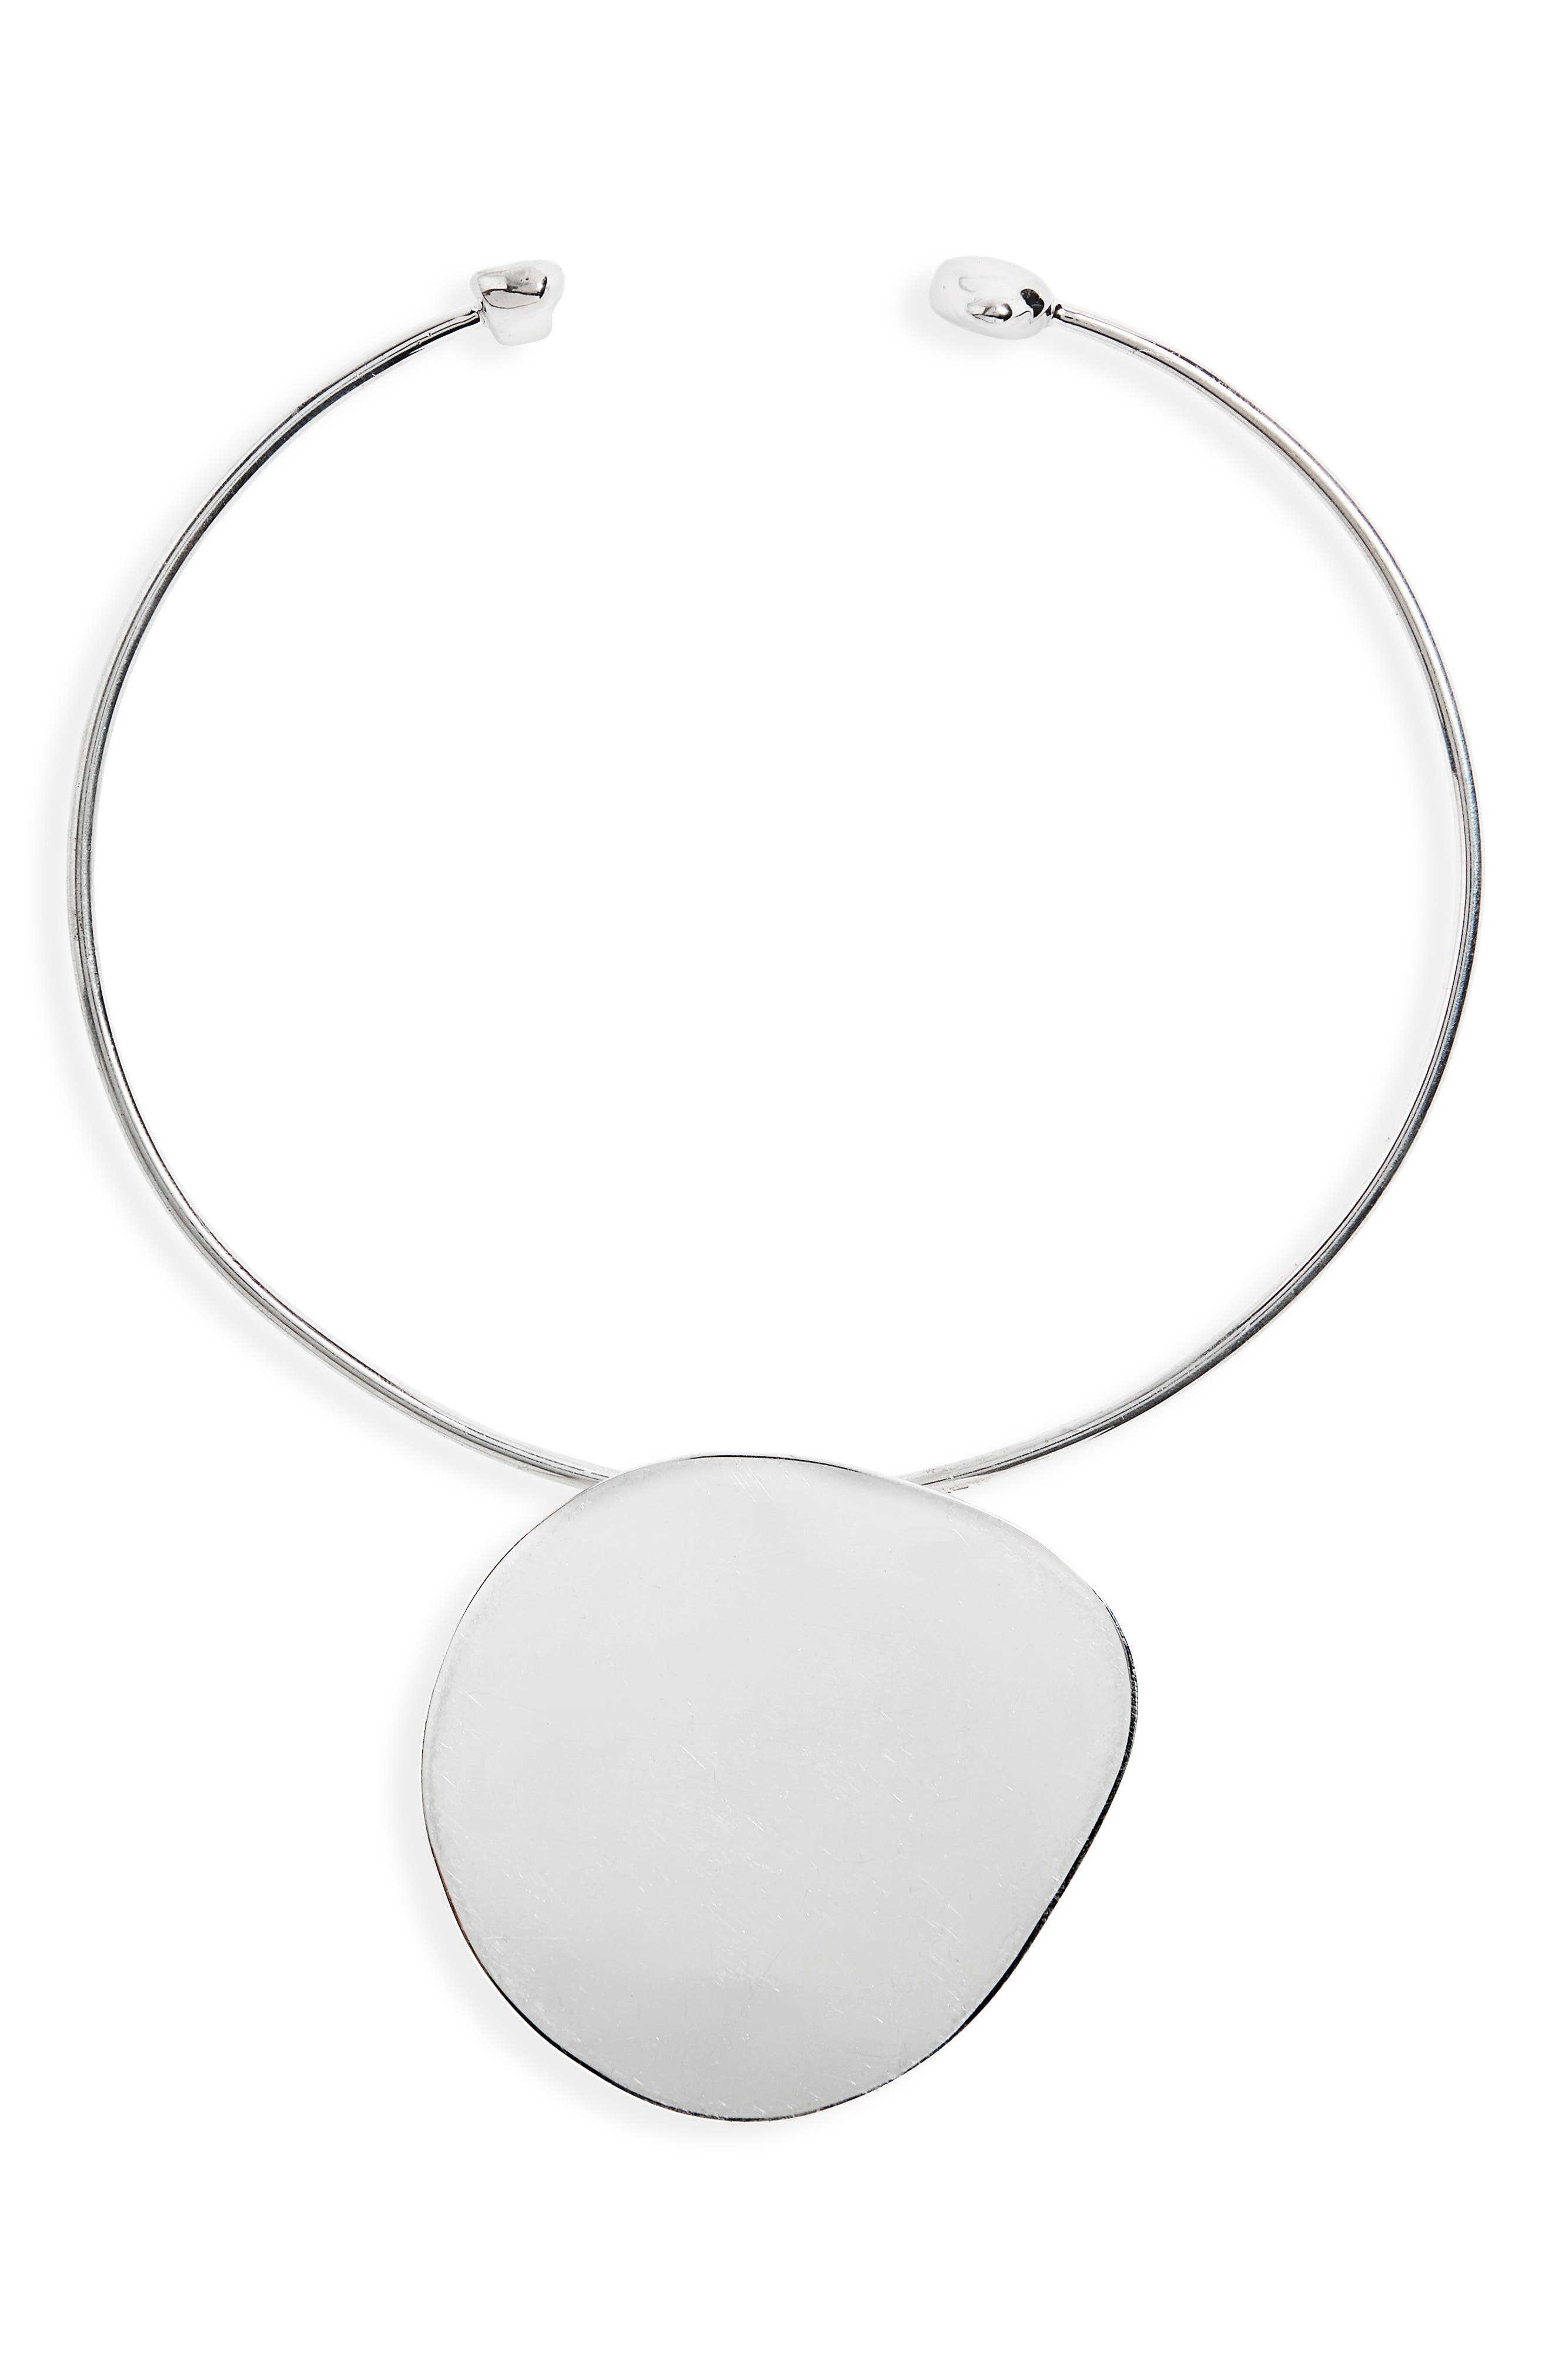 Pendo Collar Necklace,                         Main,                         color, Sterling Silver